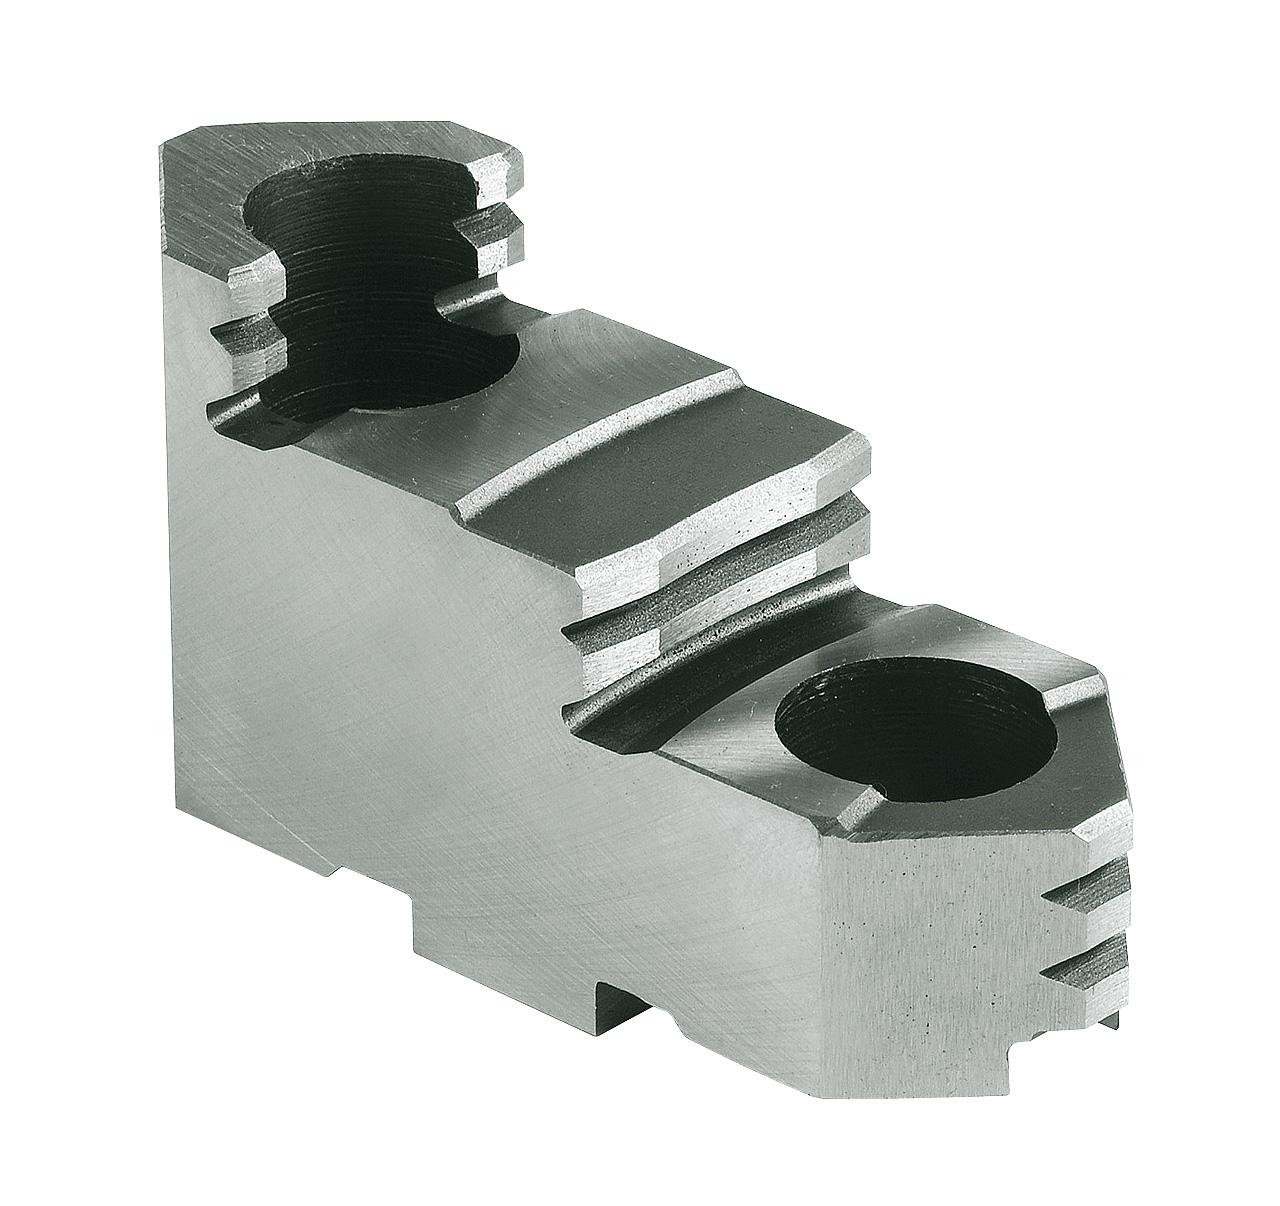 Szczęki górne twarde - komplet TJ-PS3-250 BERNARDO